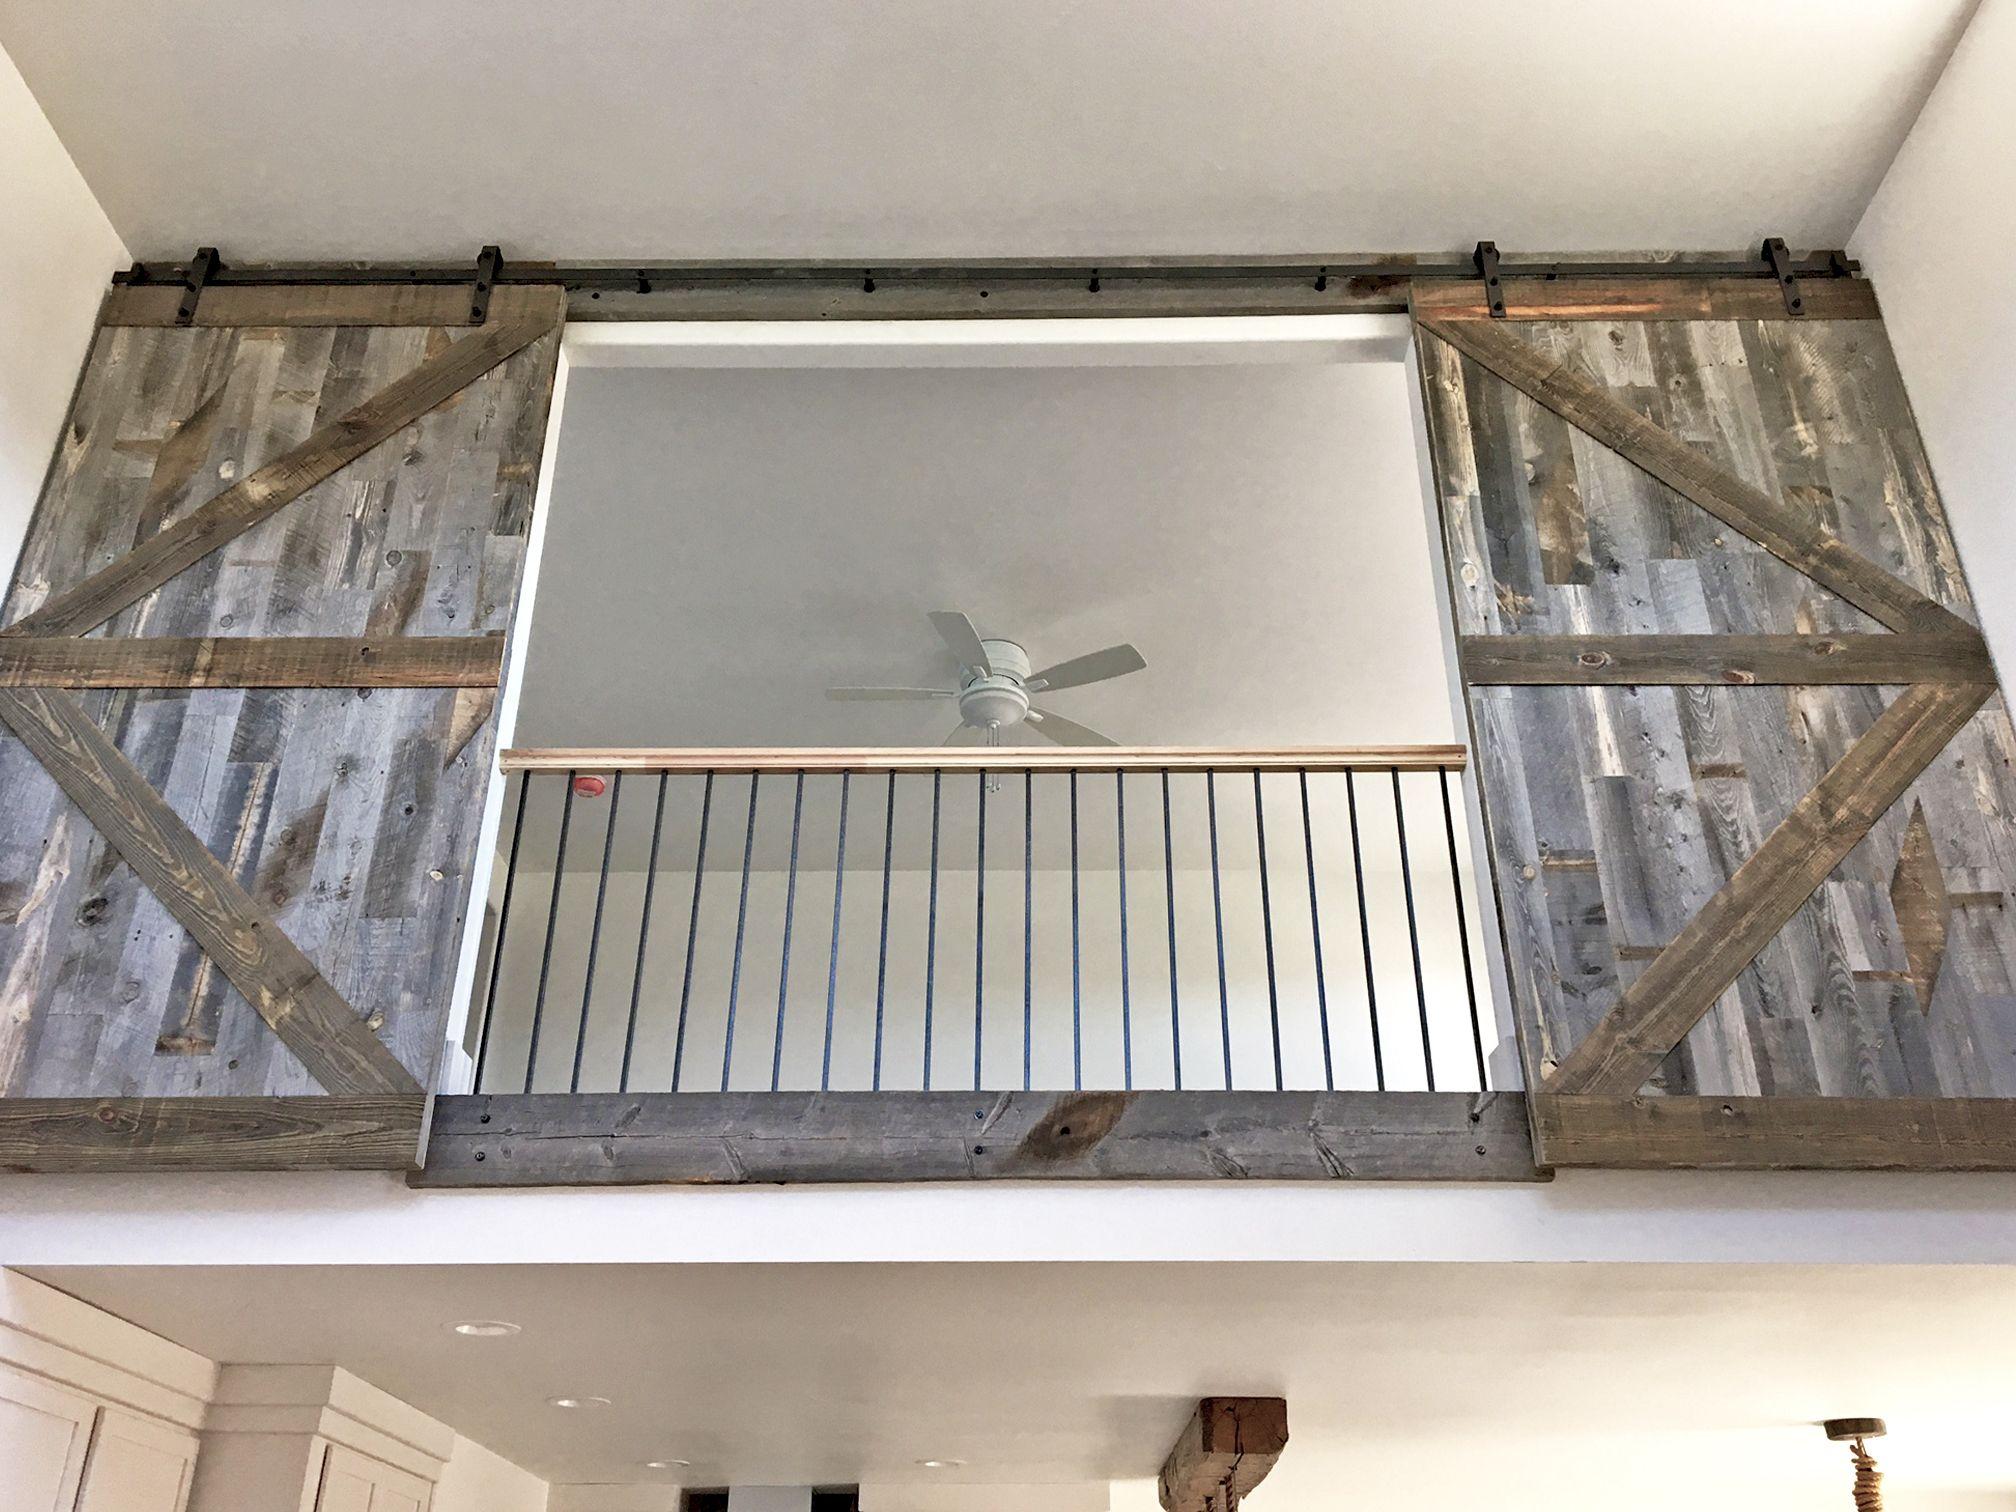 Reclaimed Wood Barn Doors Reclaimed Wood Siding Interior Barn Doors Reclaimed Wood Paneling